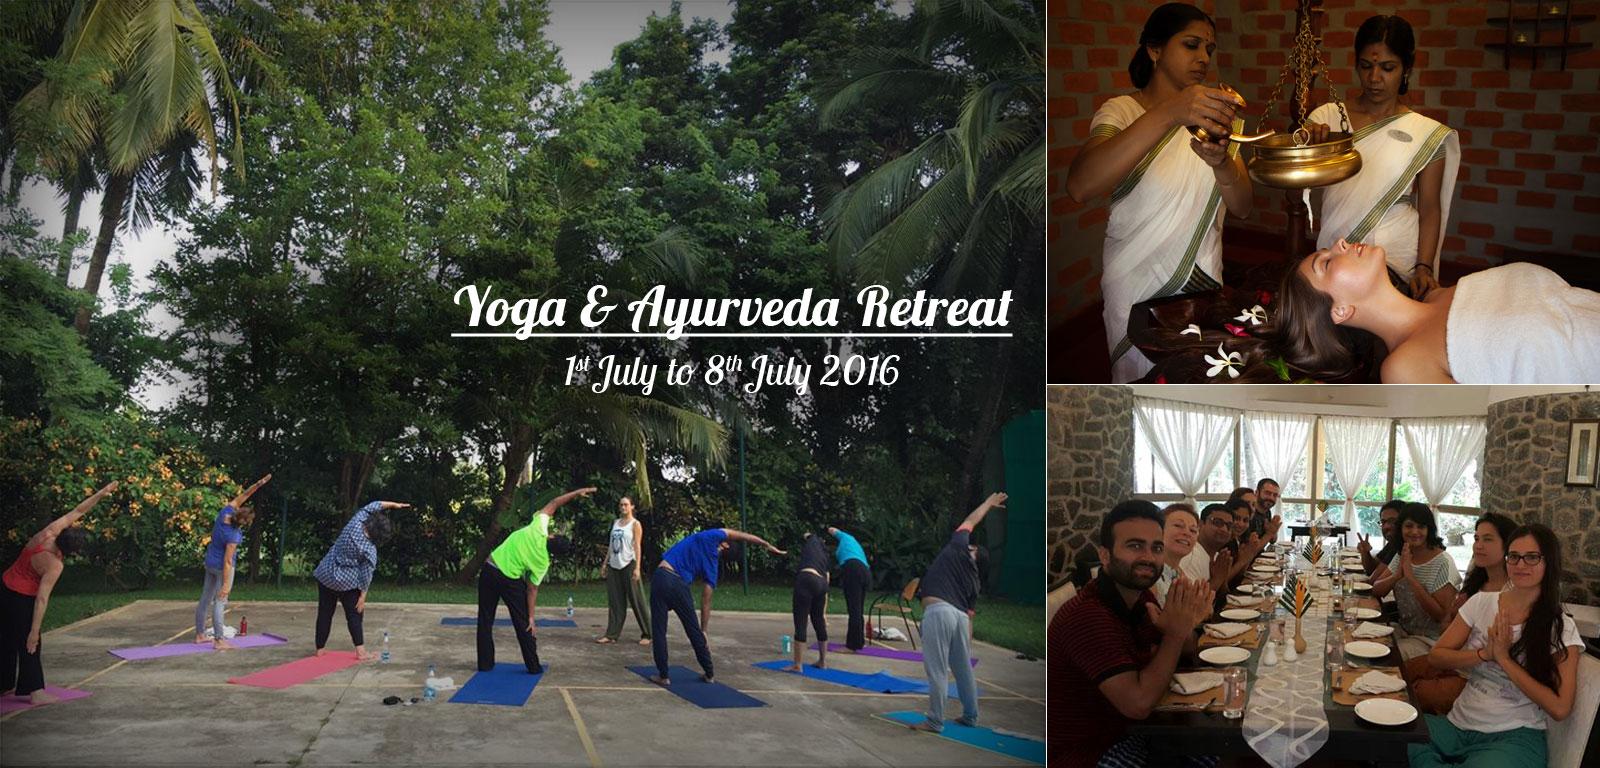 Yoga & Ayurveda Retreat 1st July - 8th July 2016